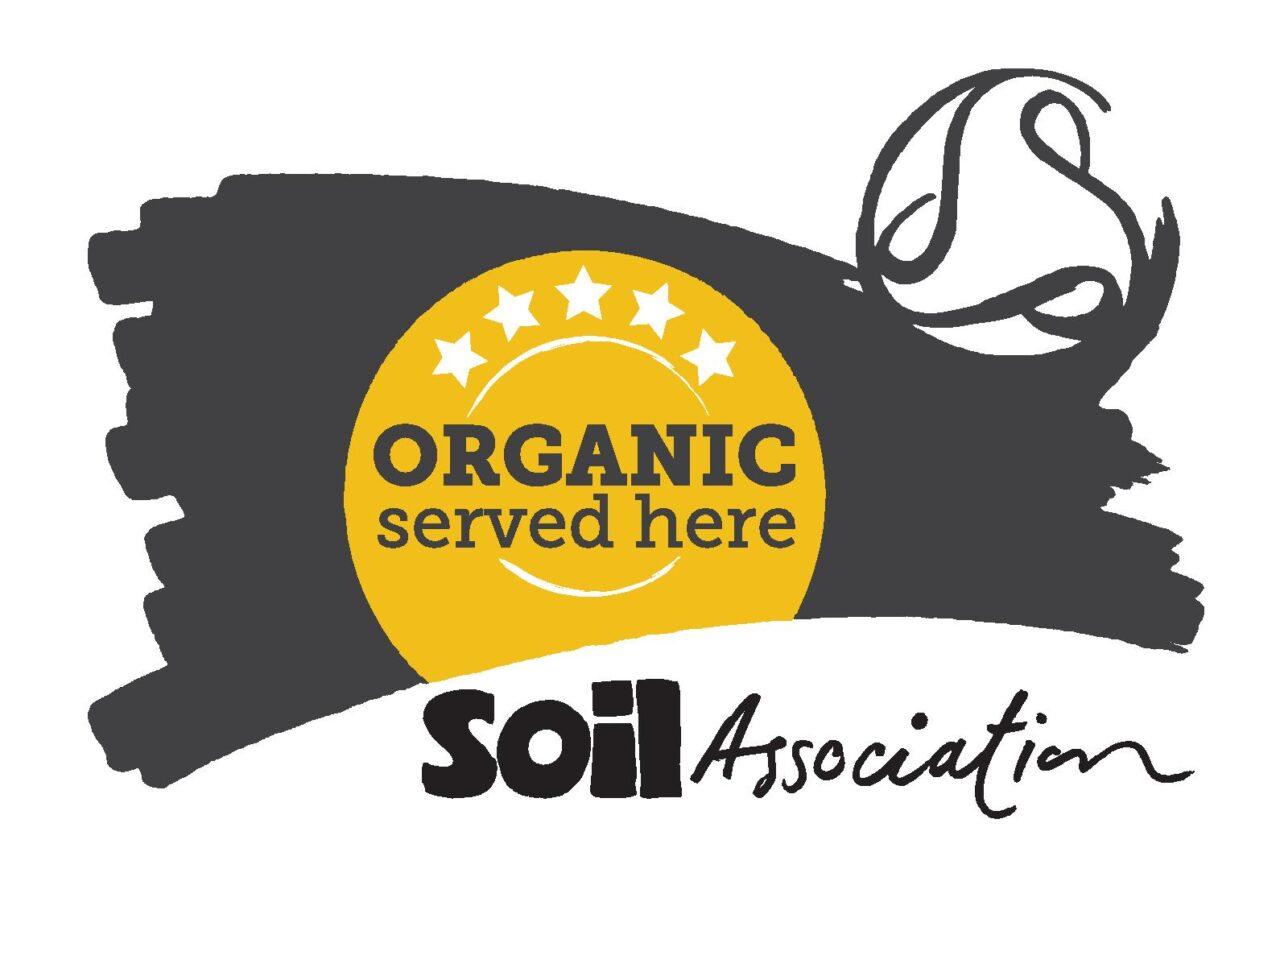 Organic Served Here Soil Association